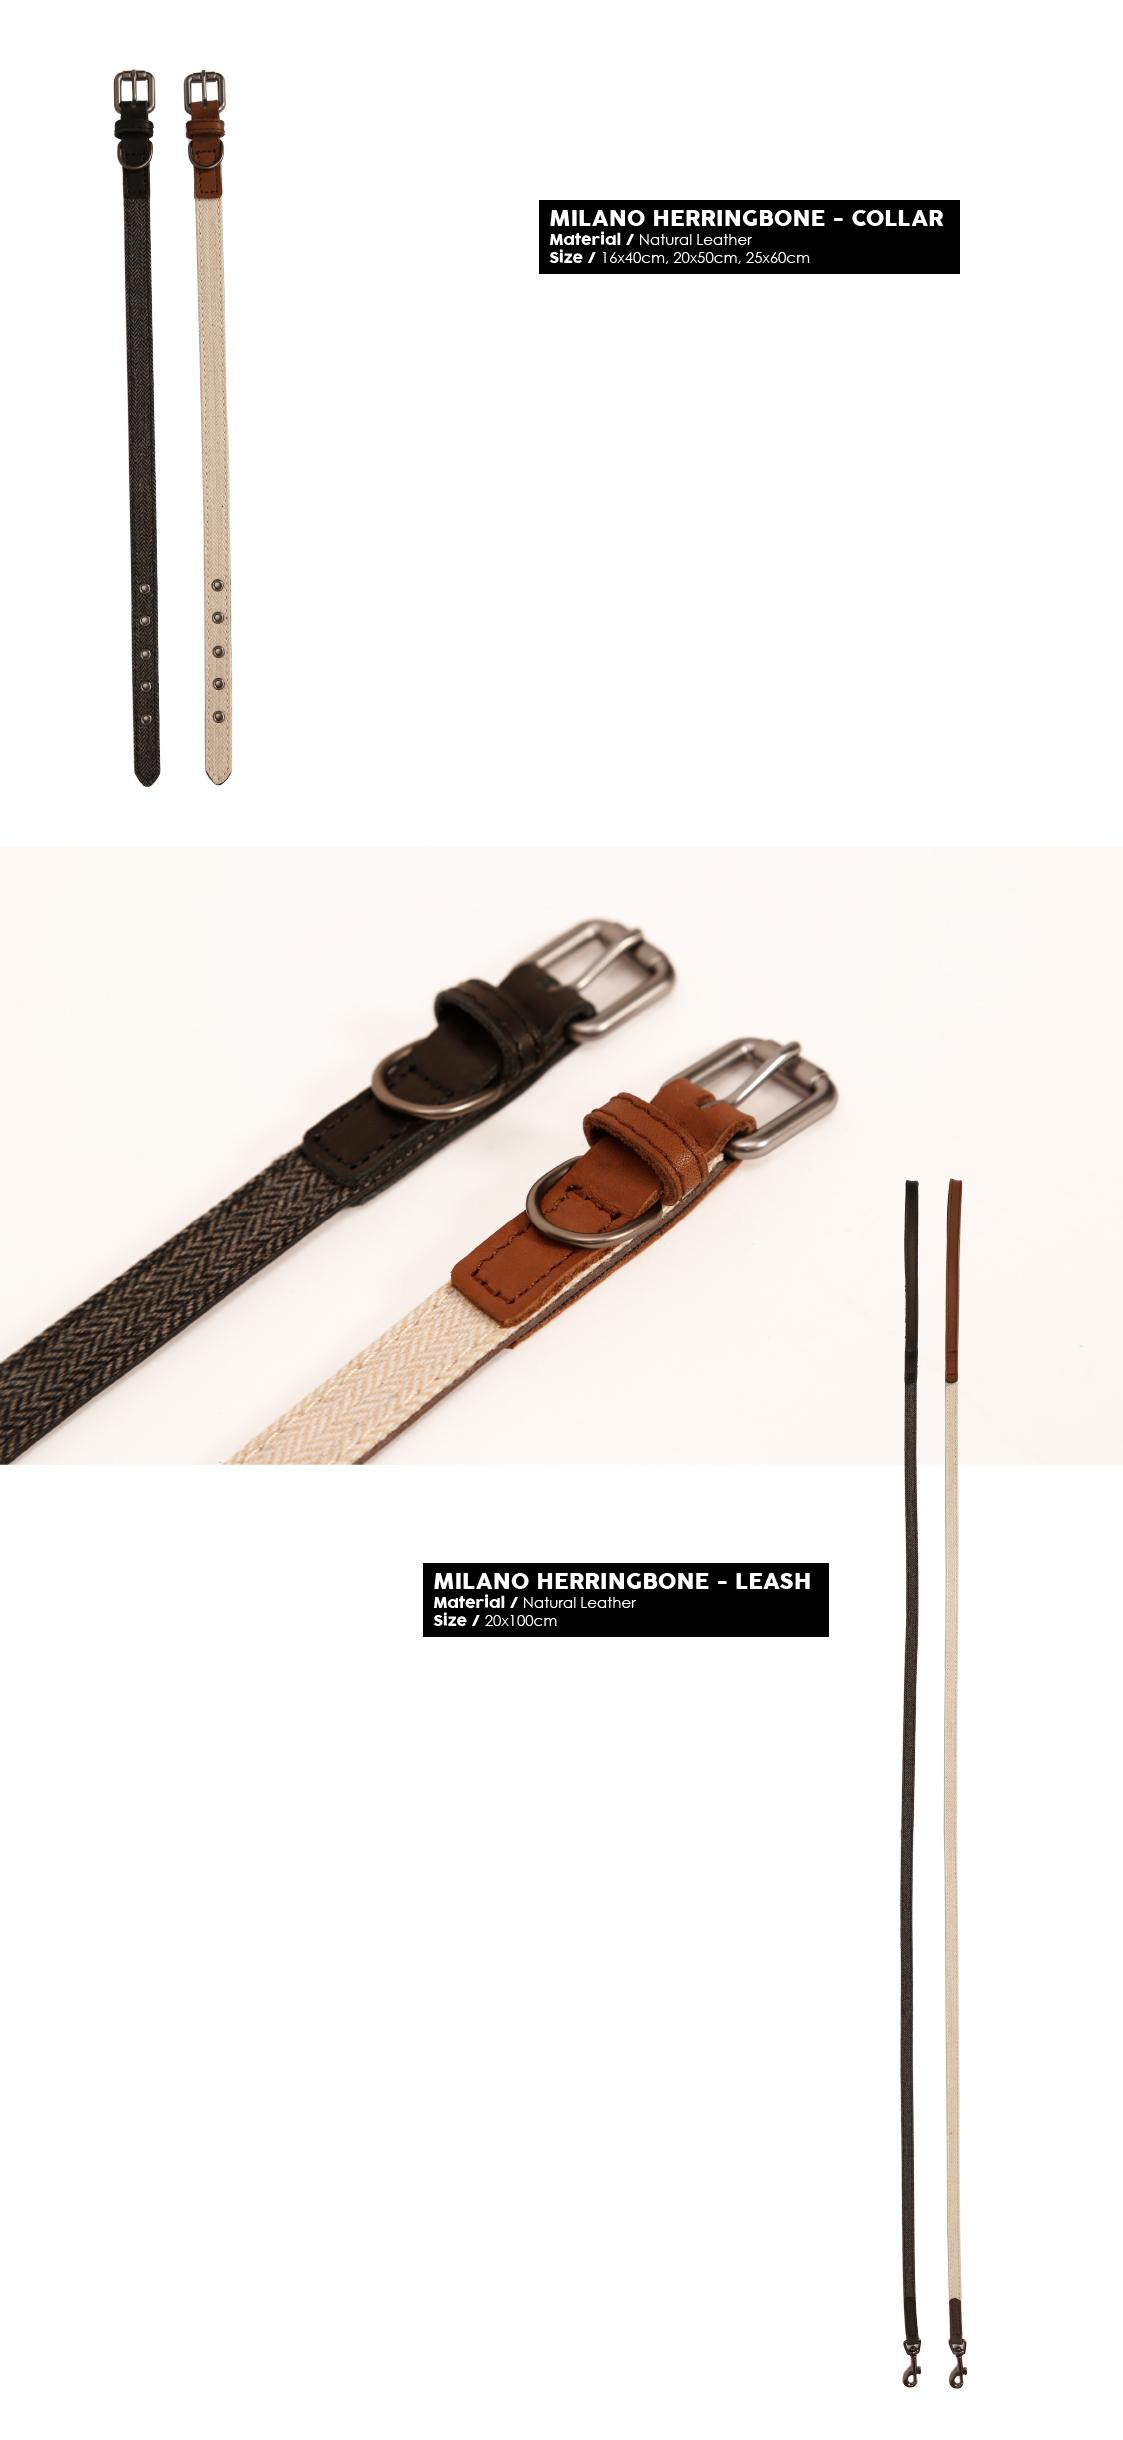 51DN - Walk - Milano Herringbone - Products1